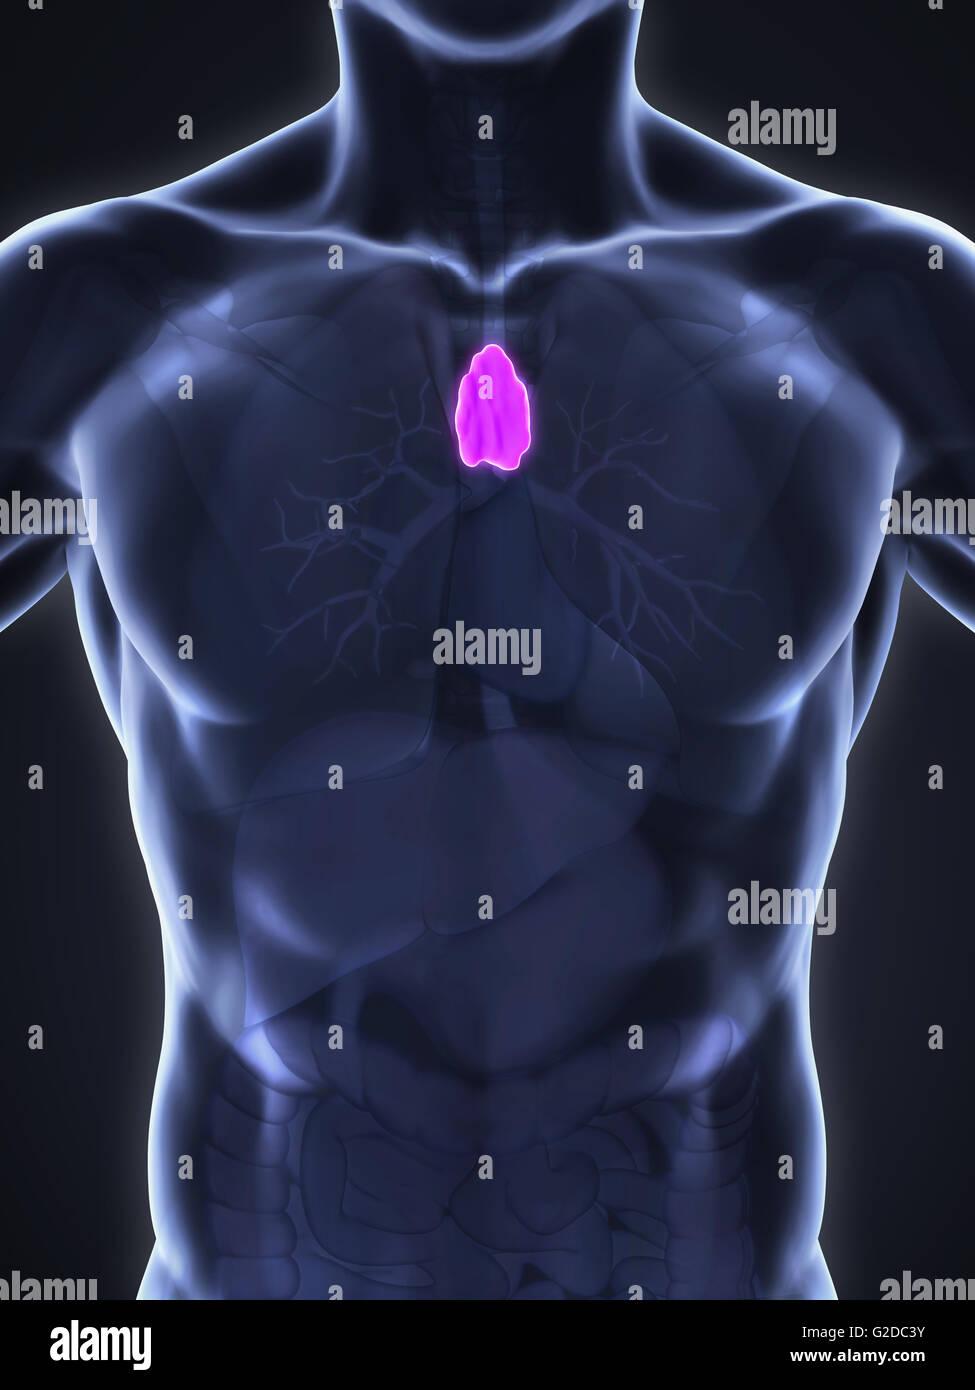 Human Lymphocyte Imágenes De Stock & Human Lymphocyte Fotos De Stock ...